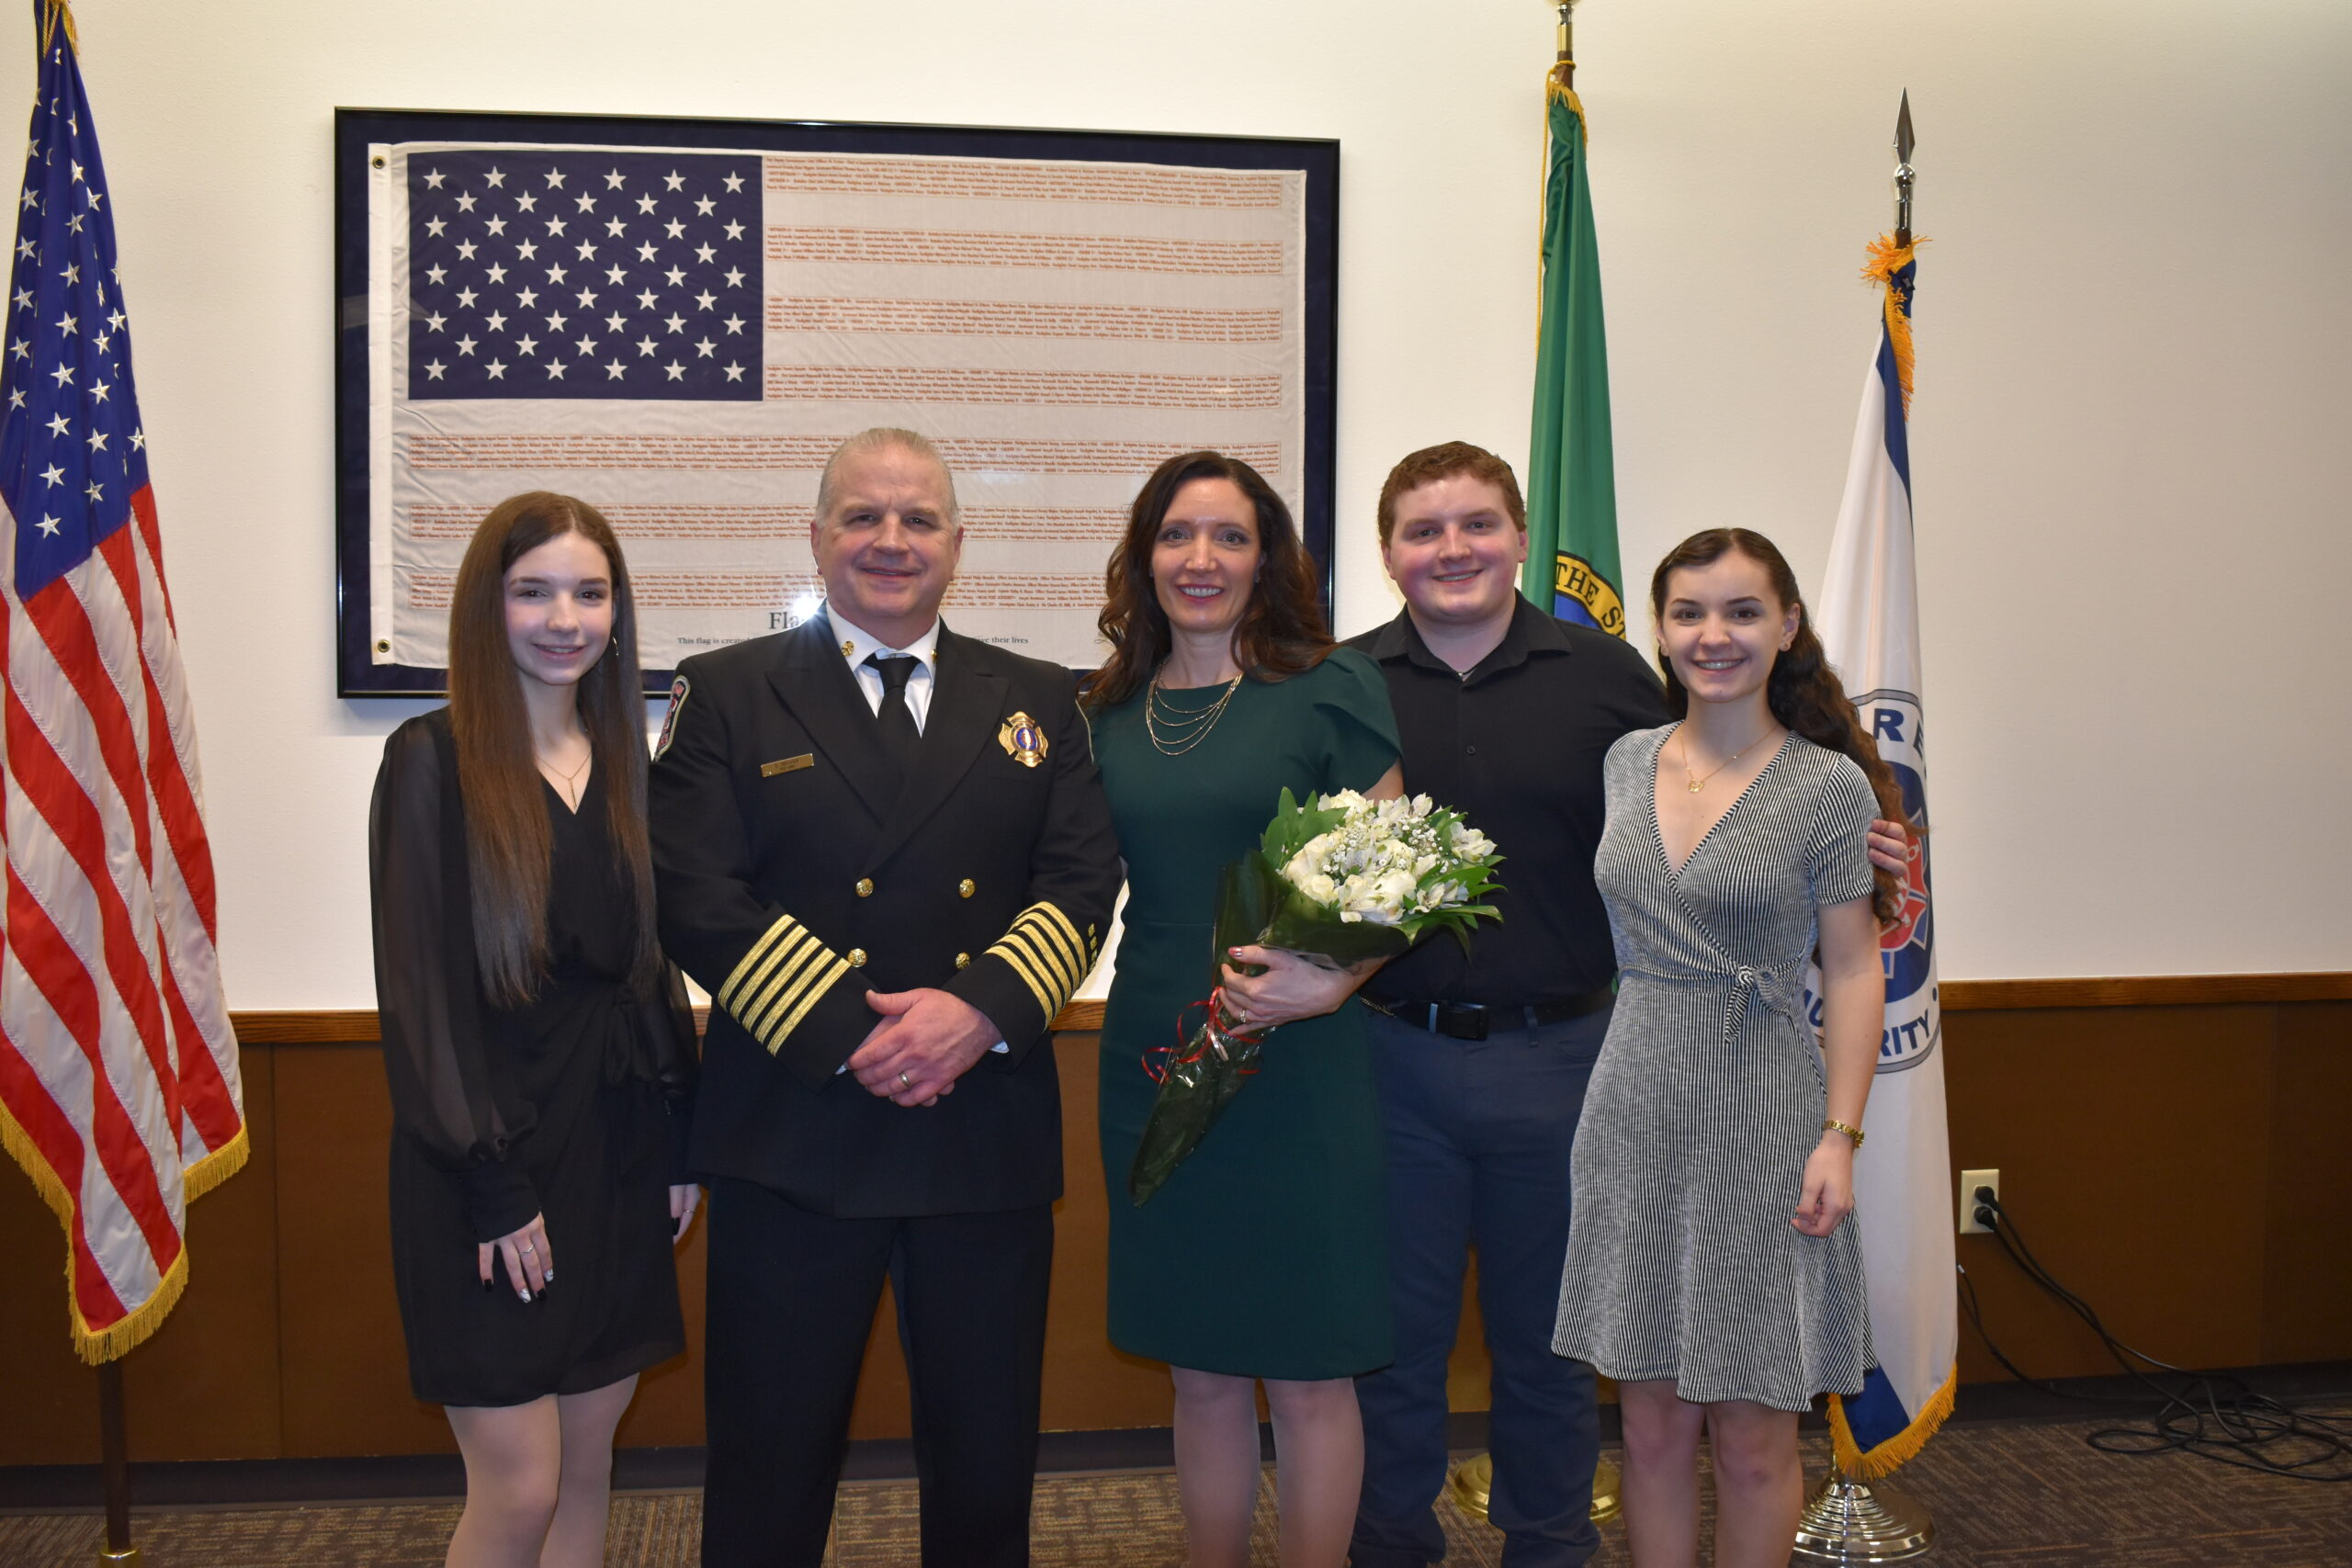 Welcome Fire Chief Steve Heitman